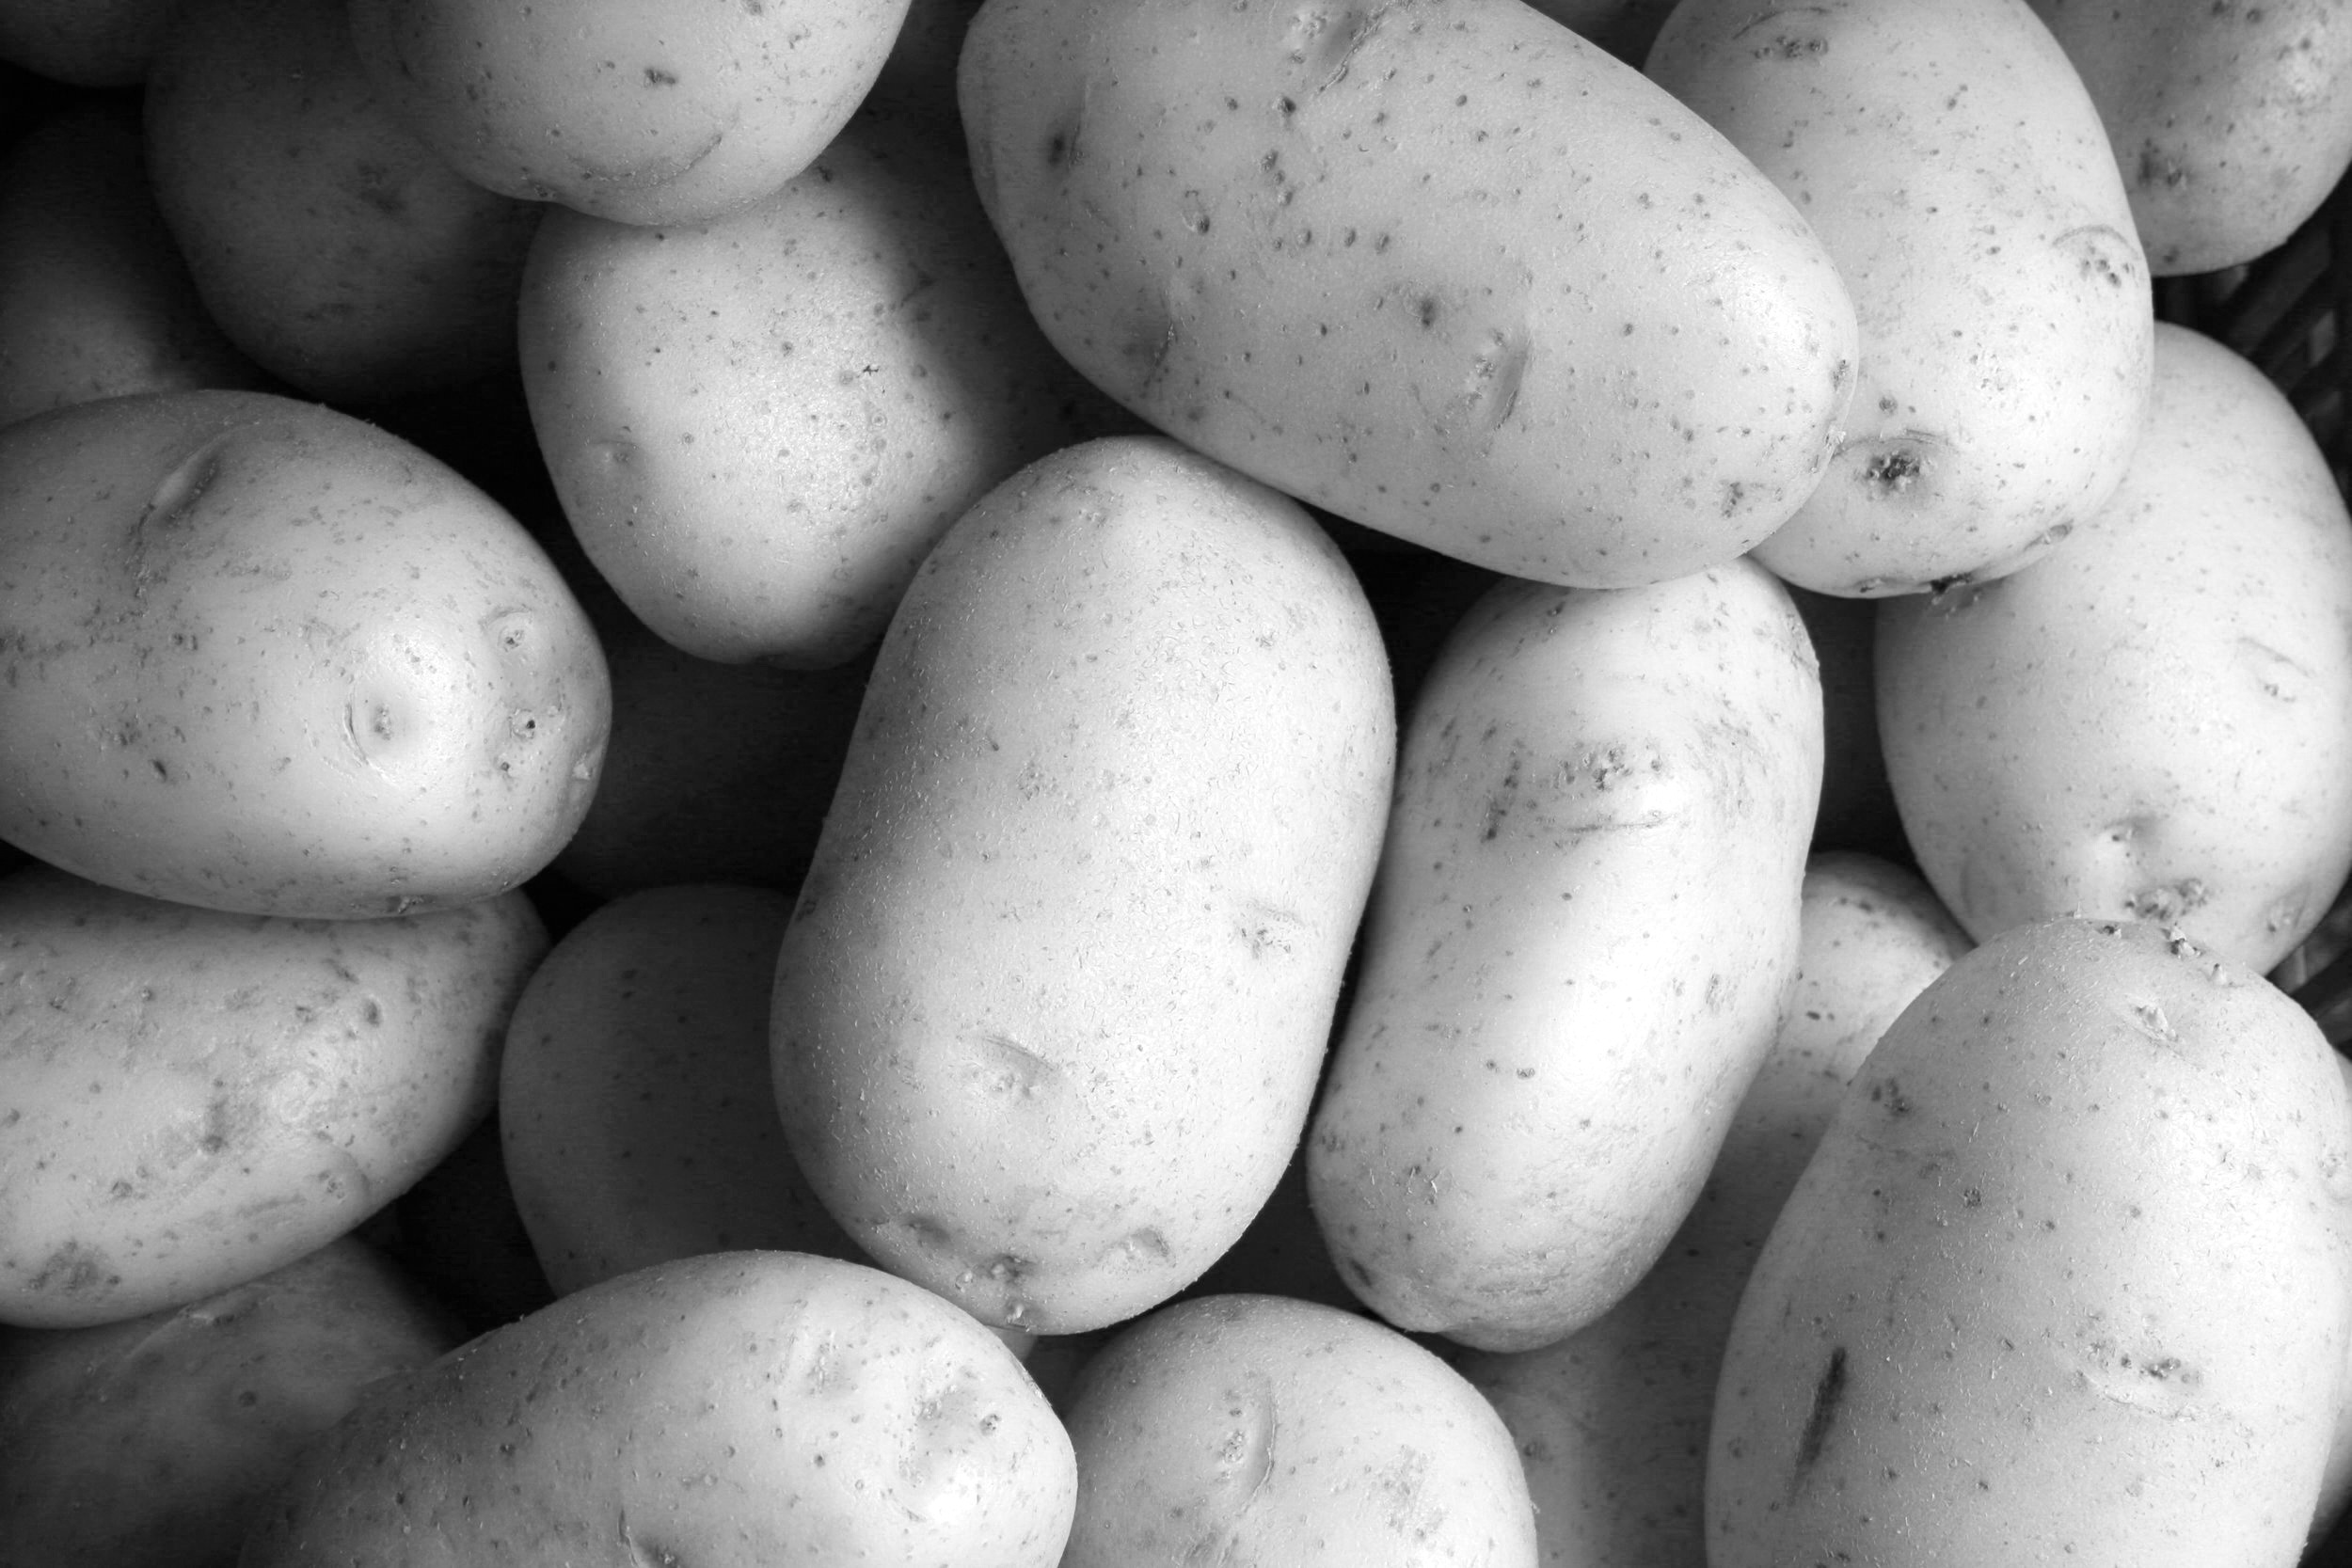 Potato Pancake - 30-45 Minutes